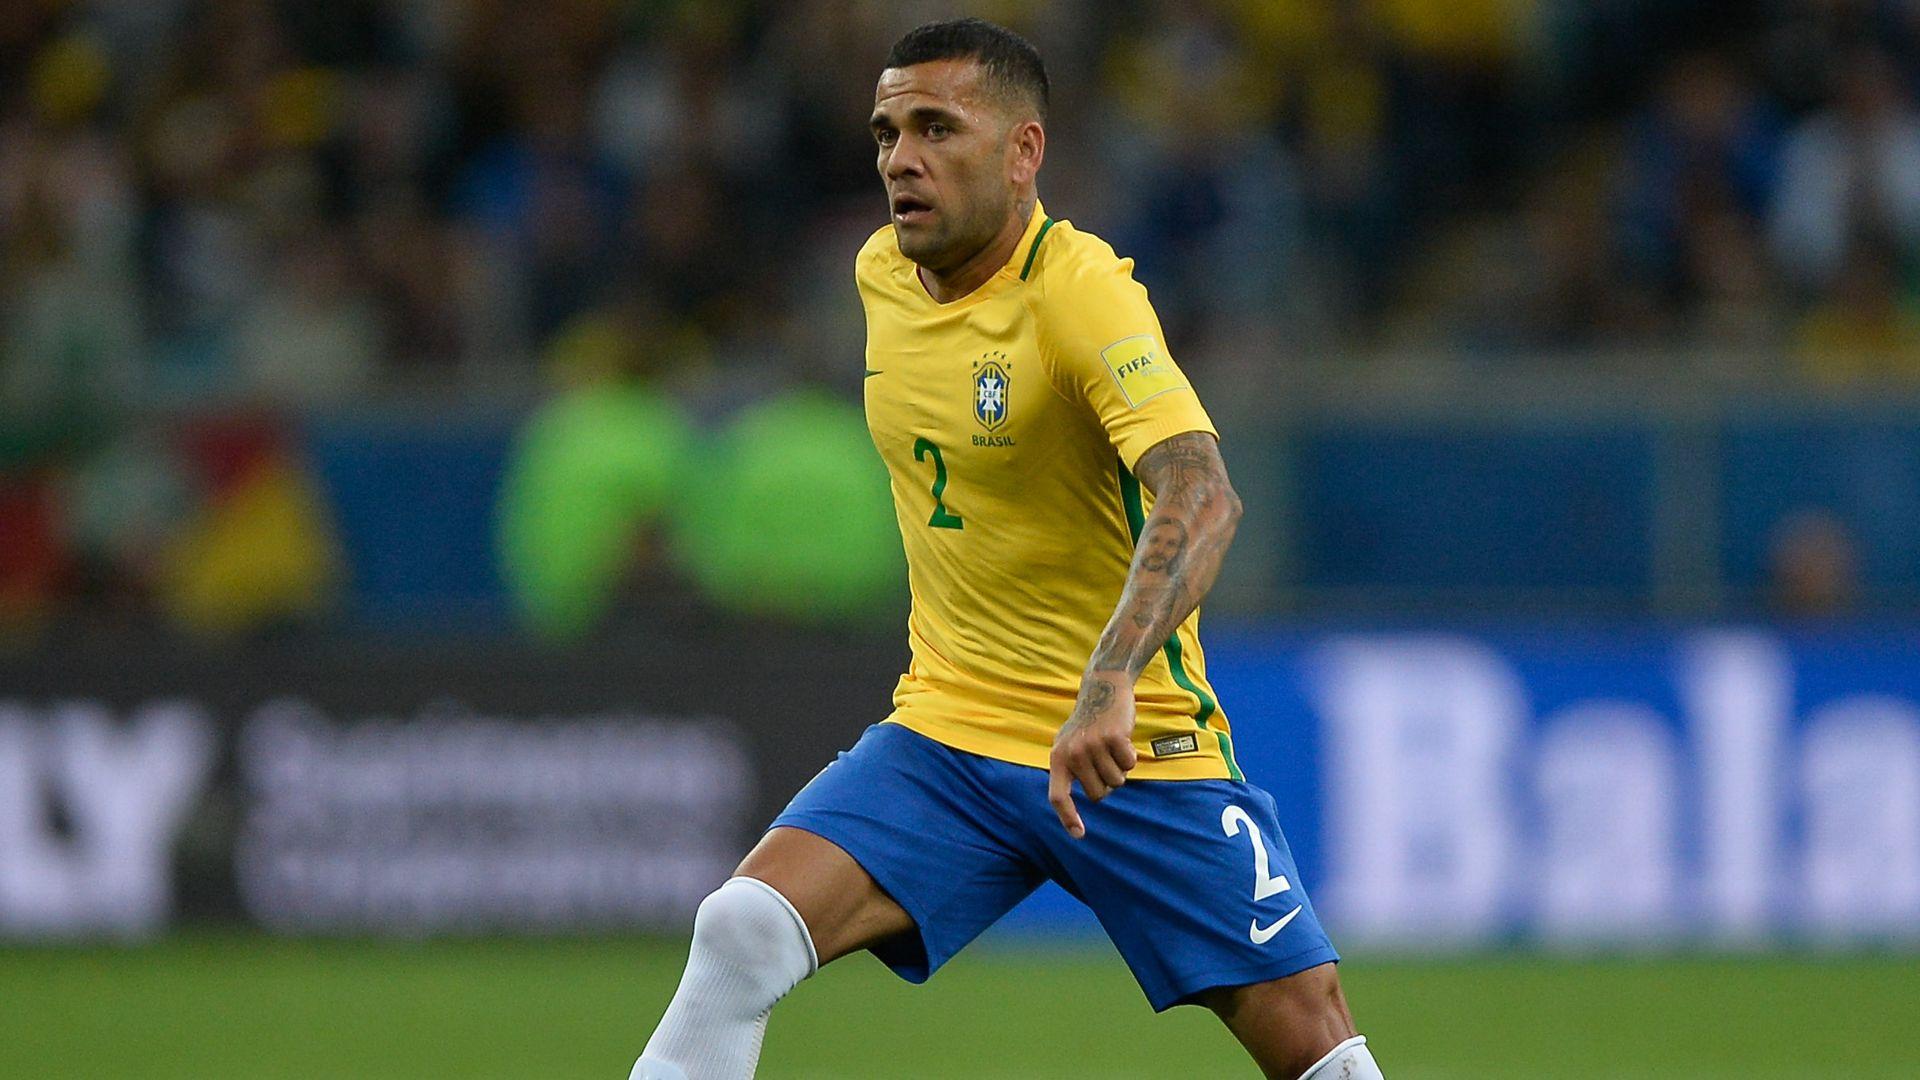 Dani Alves Brazil Ecuador Eliminatorias 2018 31082017